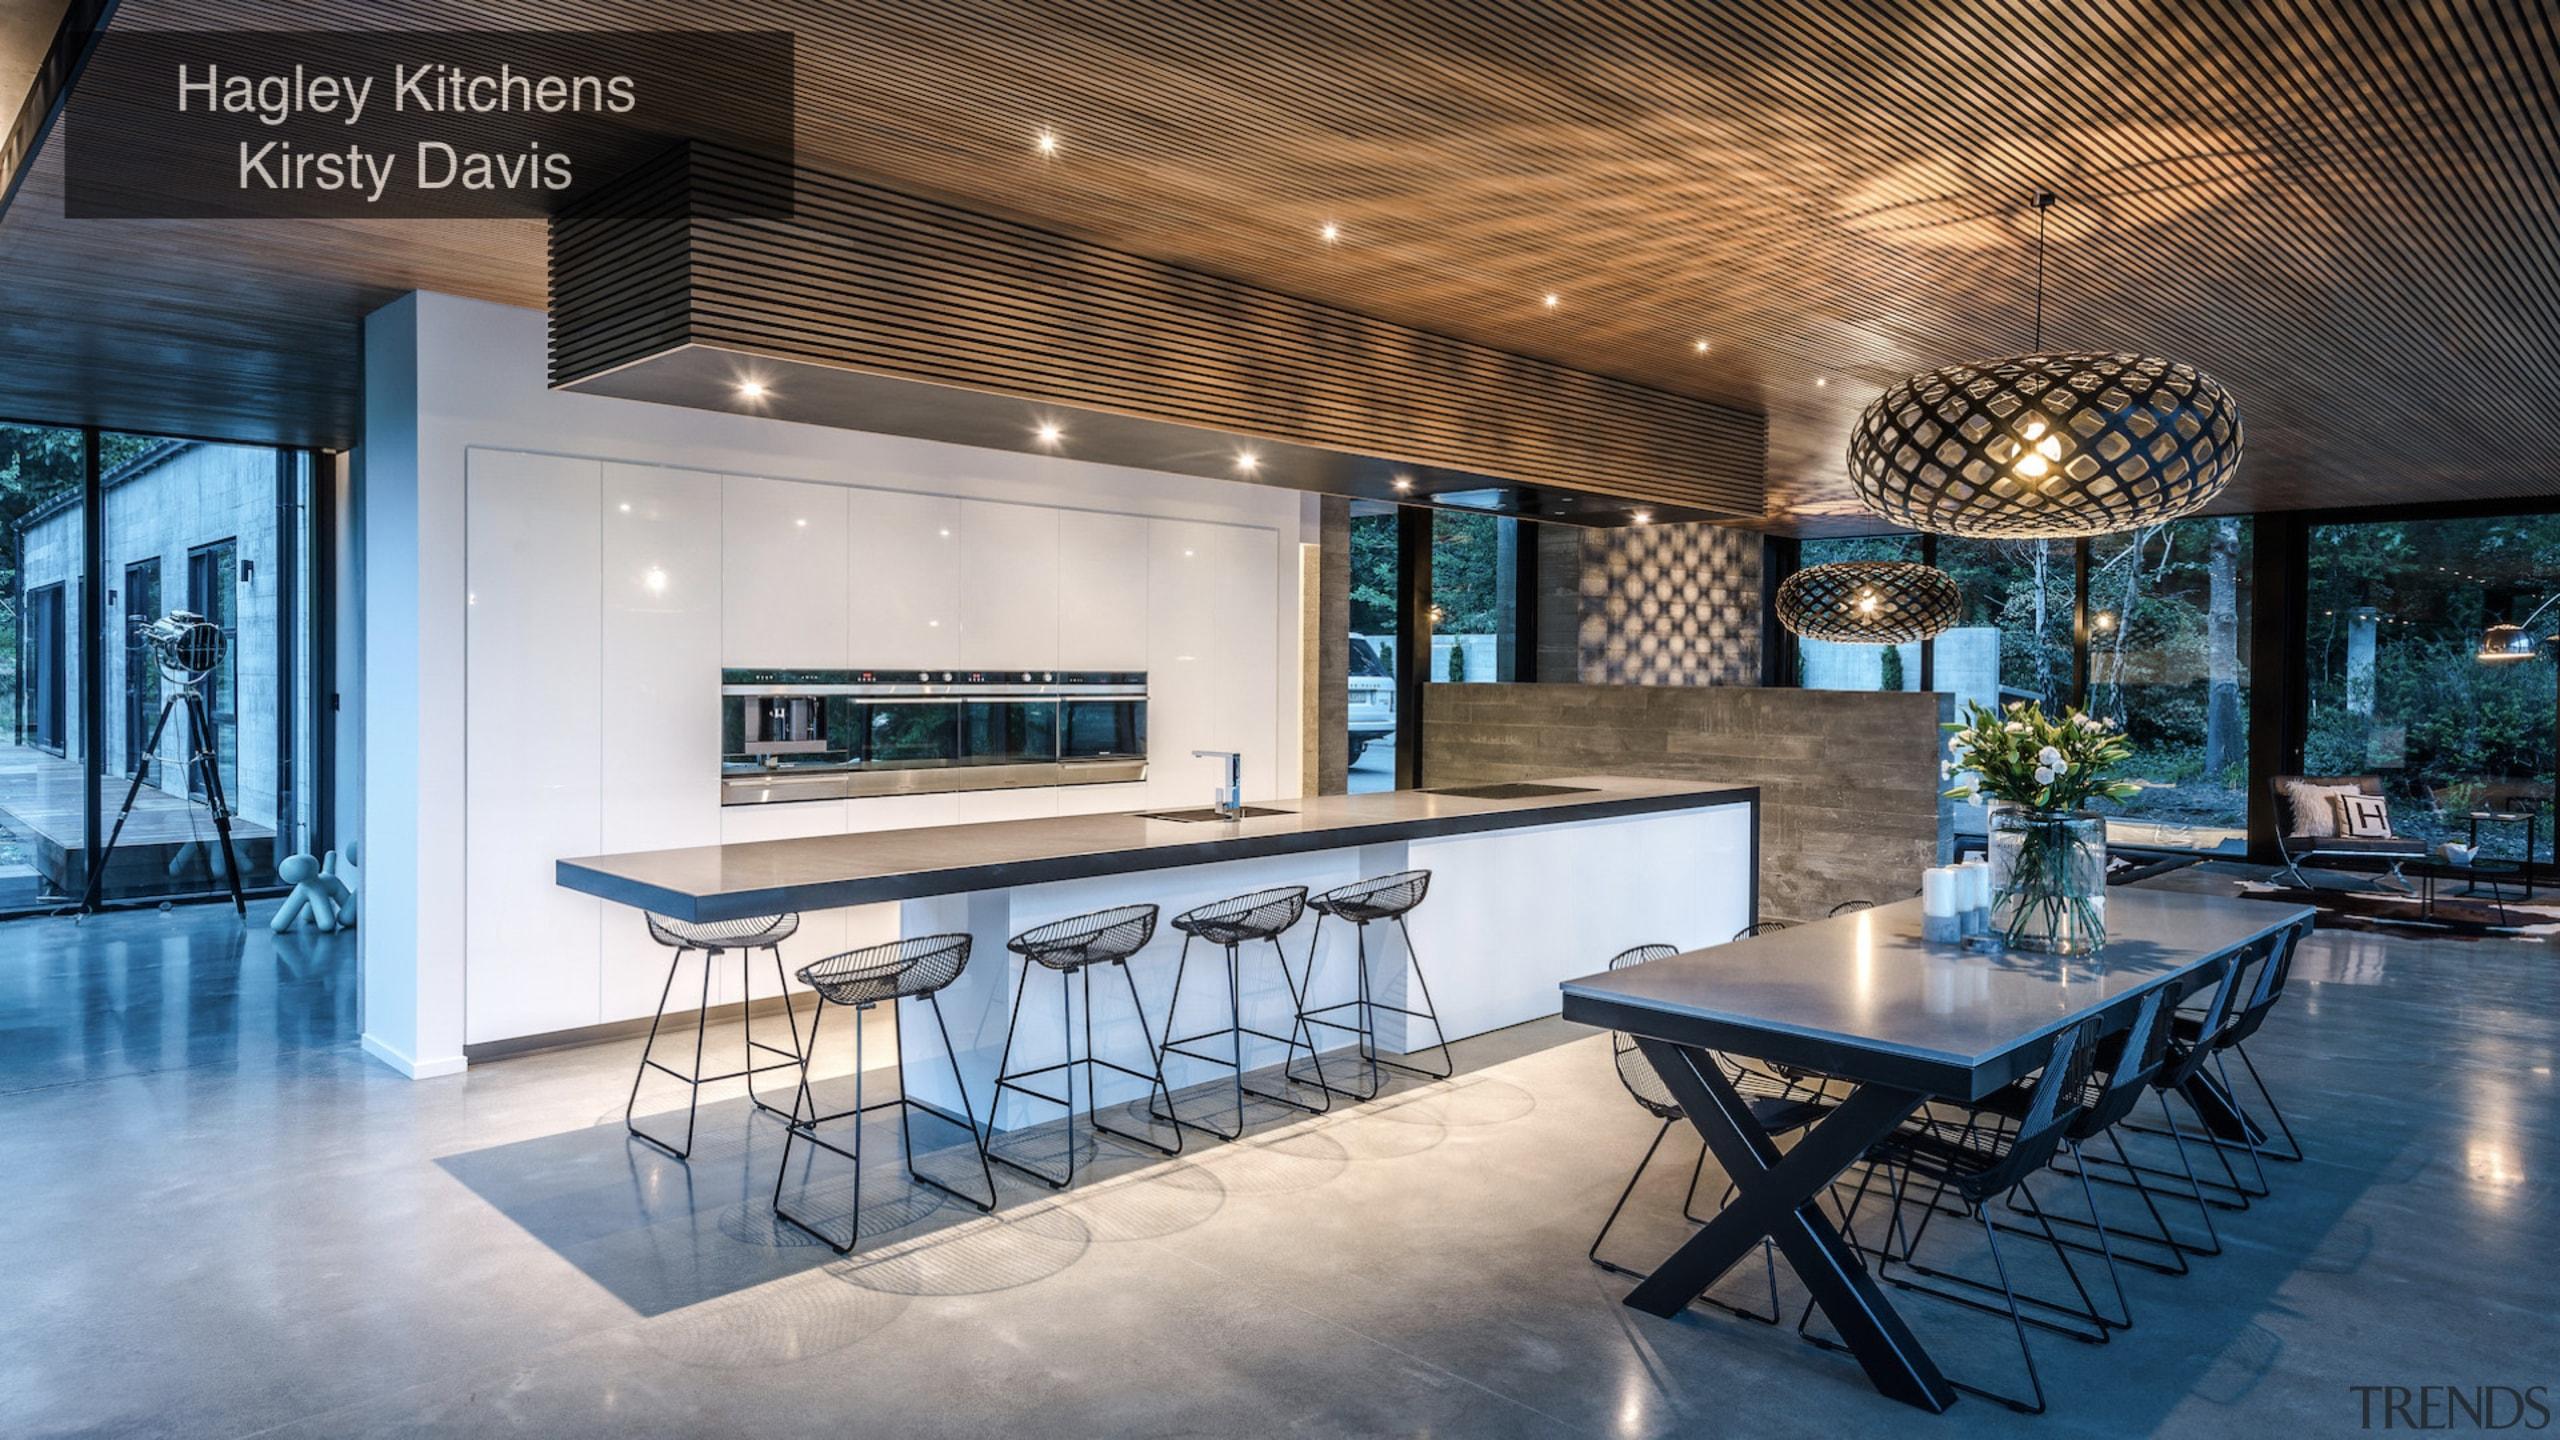 Hagley Kitchens, Kirsty Davis – TIDA New Zealand architecture, ceiling, estate, home, interior design, real estate, table, gray